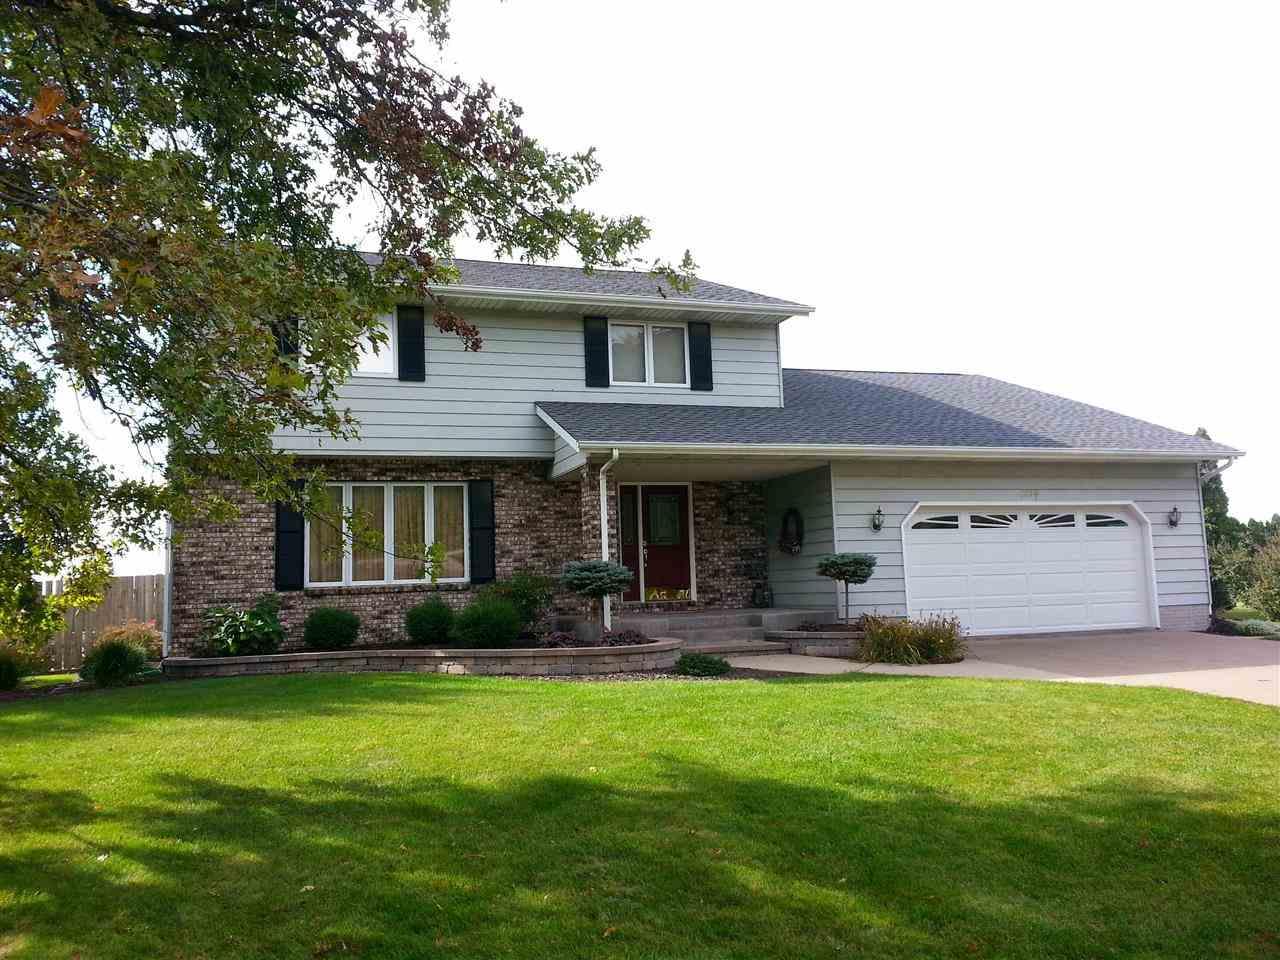 Real Estate for Sale, ListingId: 30025328, Orion,IL61273